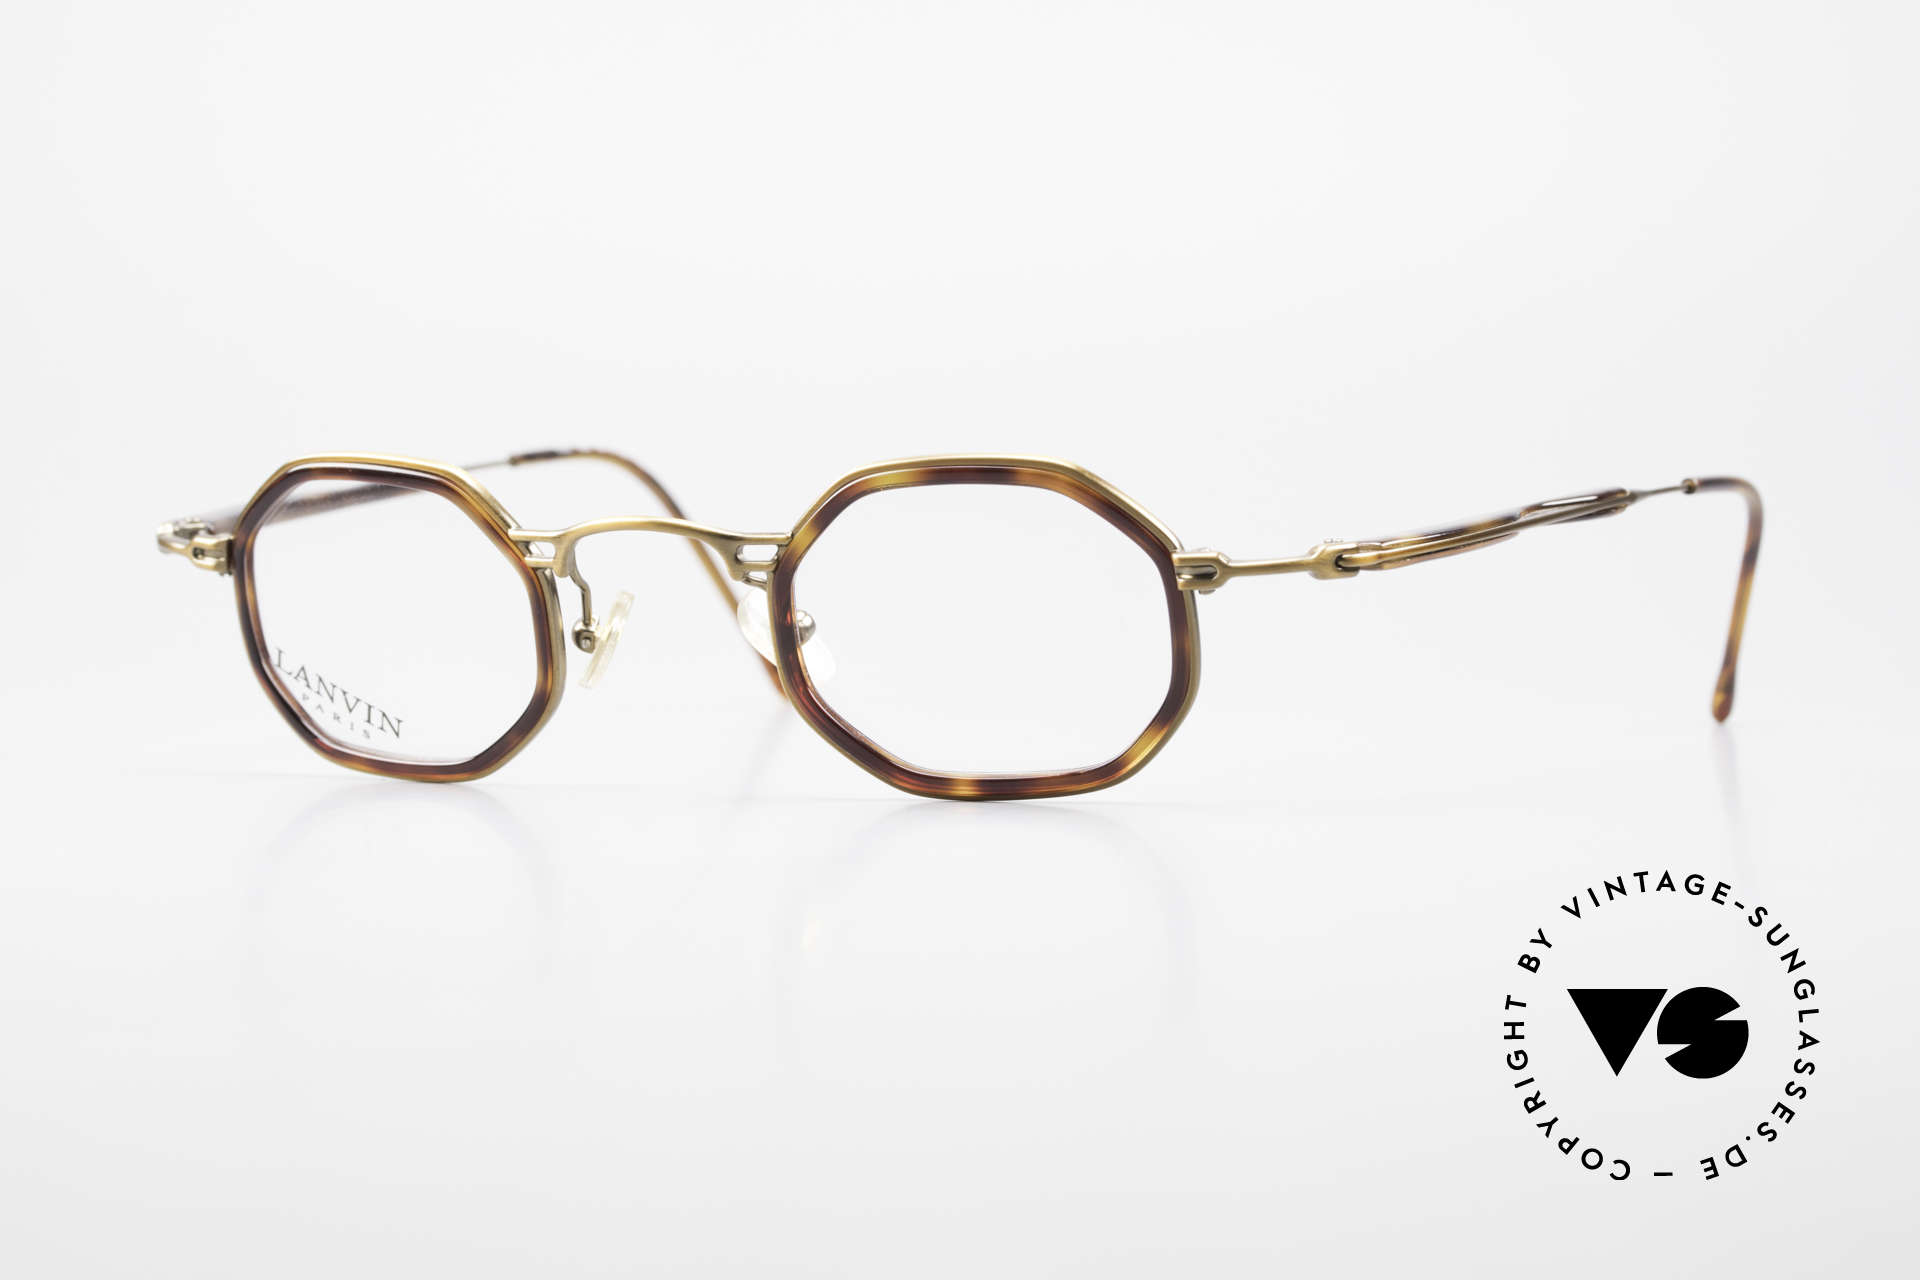 Lanvin 1222 Octagonal Combi Glasses 90's, octagonal 'combi glasses' by LANVIN, PARIS, Made for Men and Women